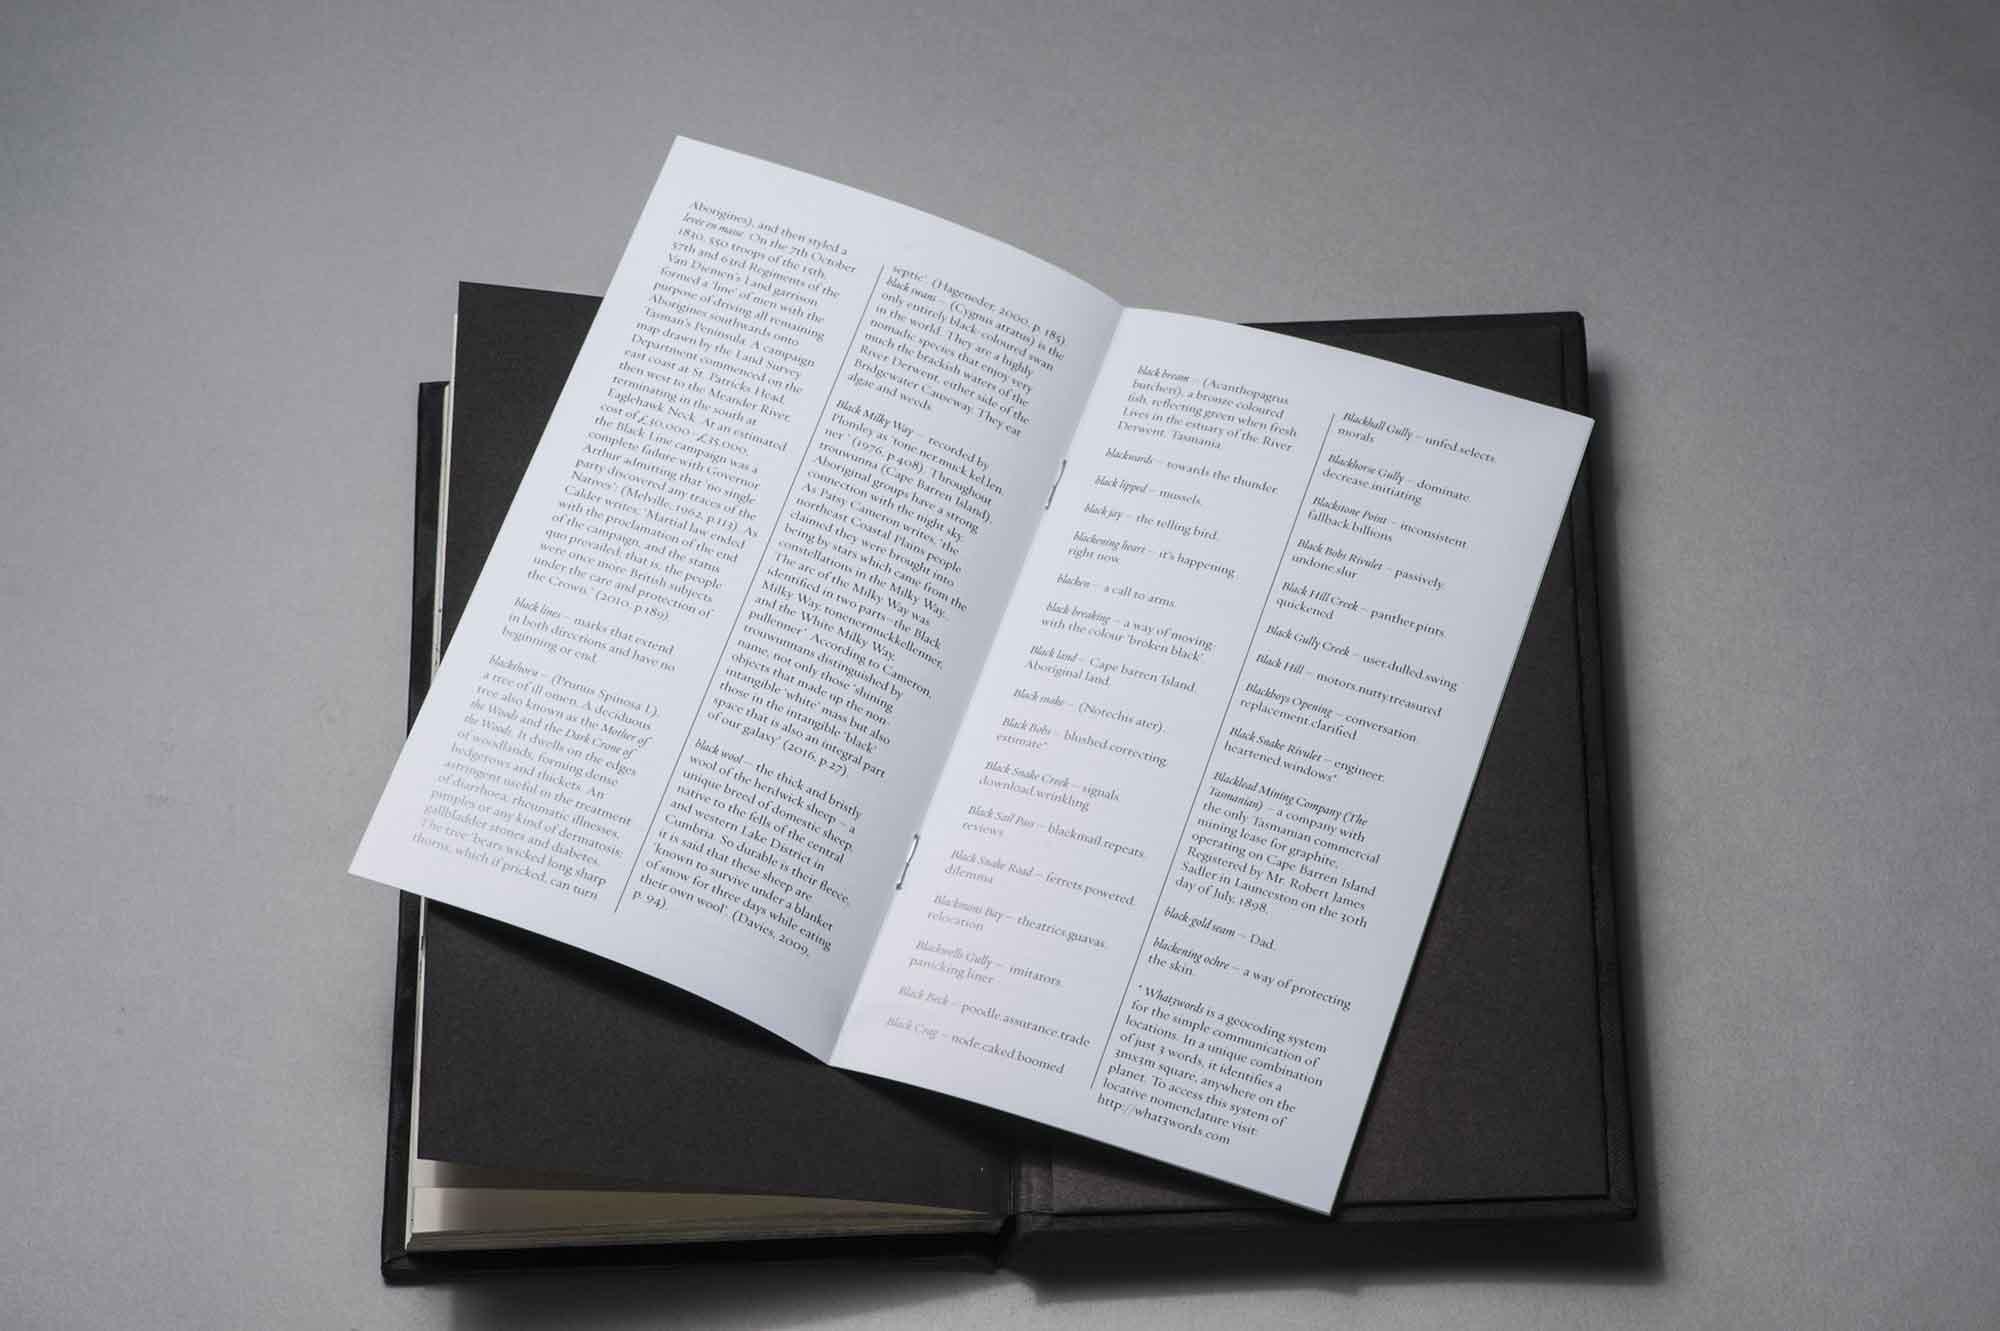 FOTD book, 3